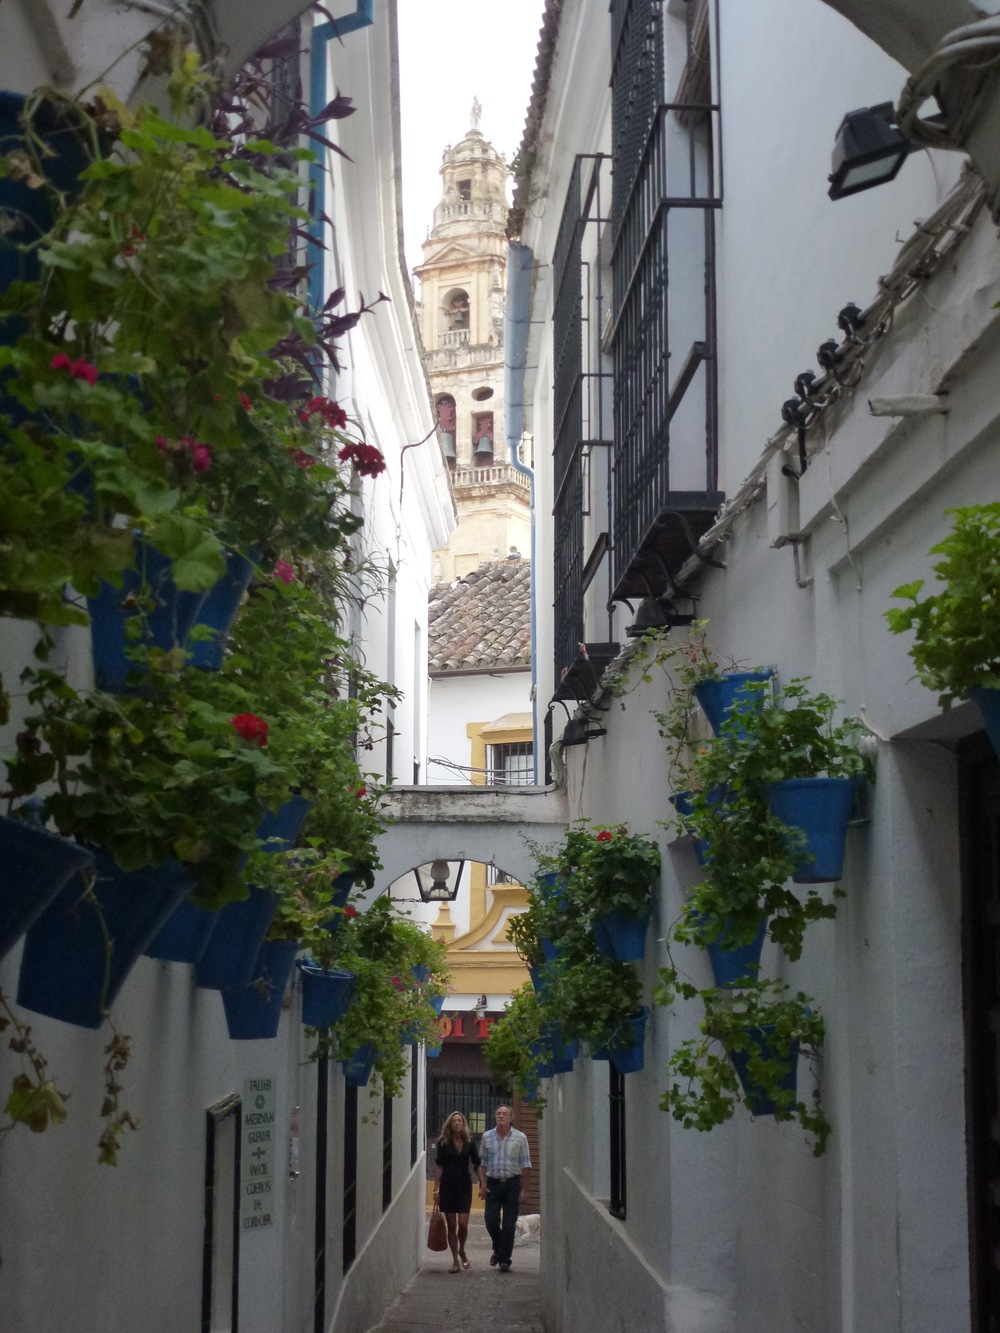 Walking through the Jewish Quarter of Cordoba